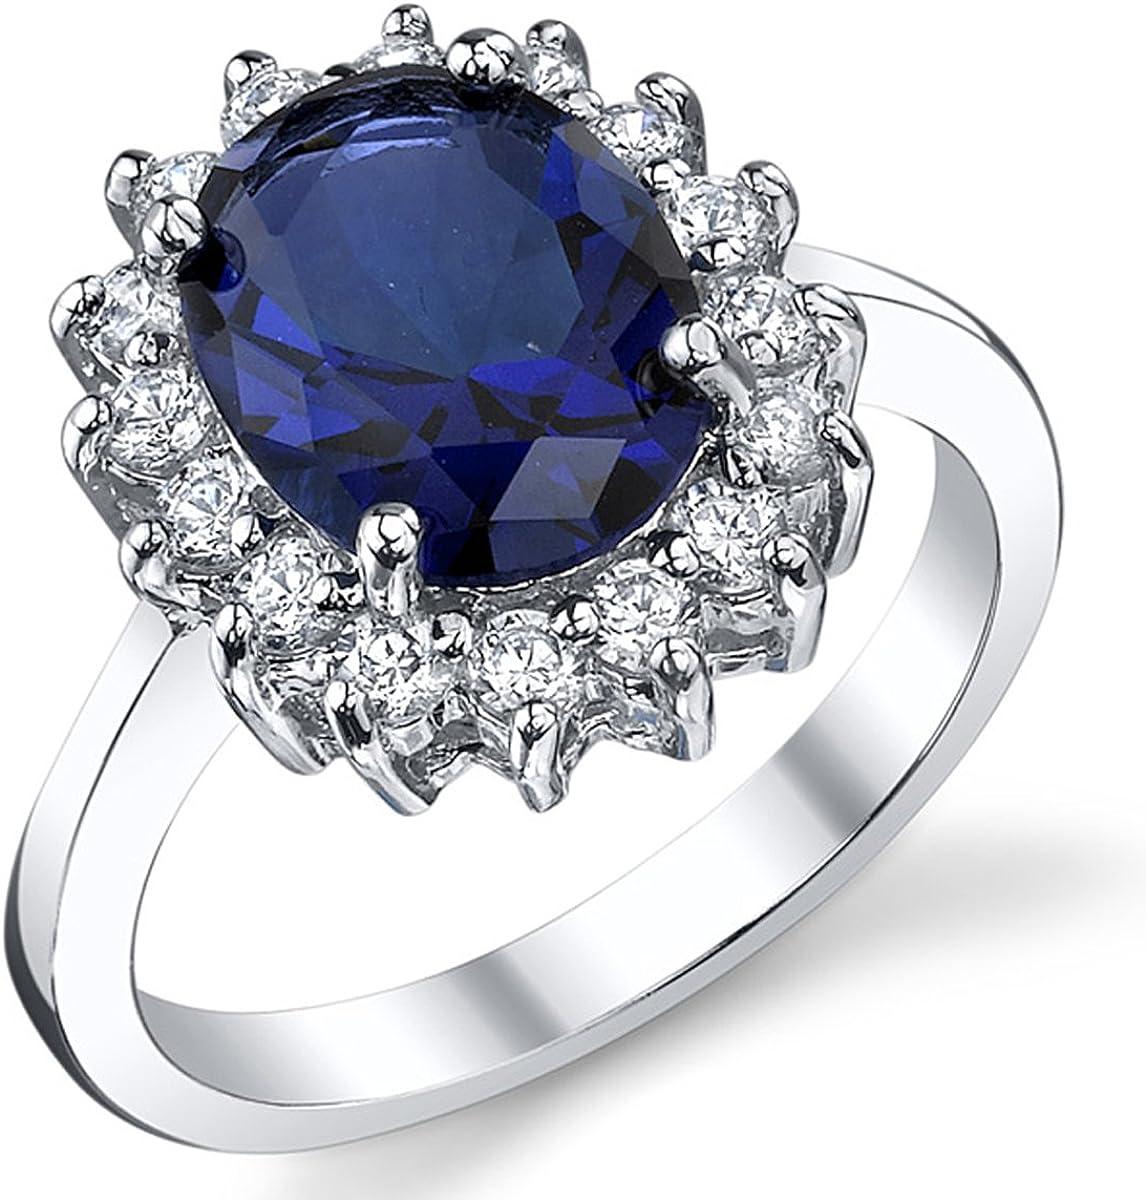 Princesse Diana William Kate Bagues Gemme Bleu Saphir Mariage Fiançailles 925